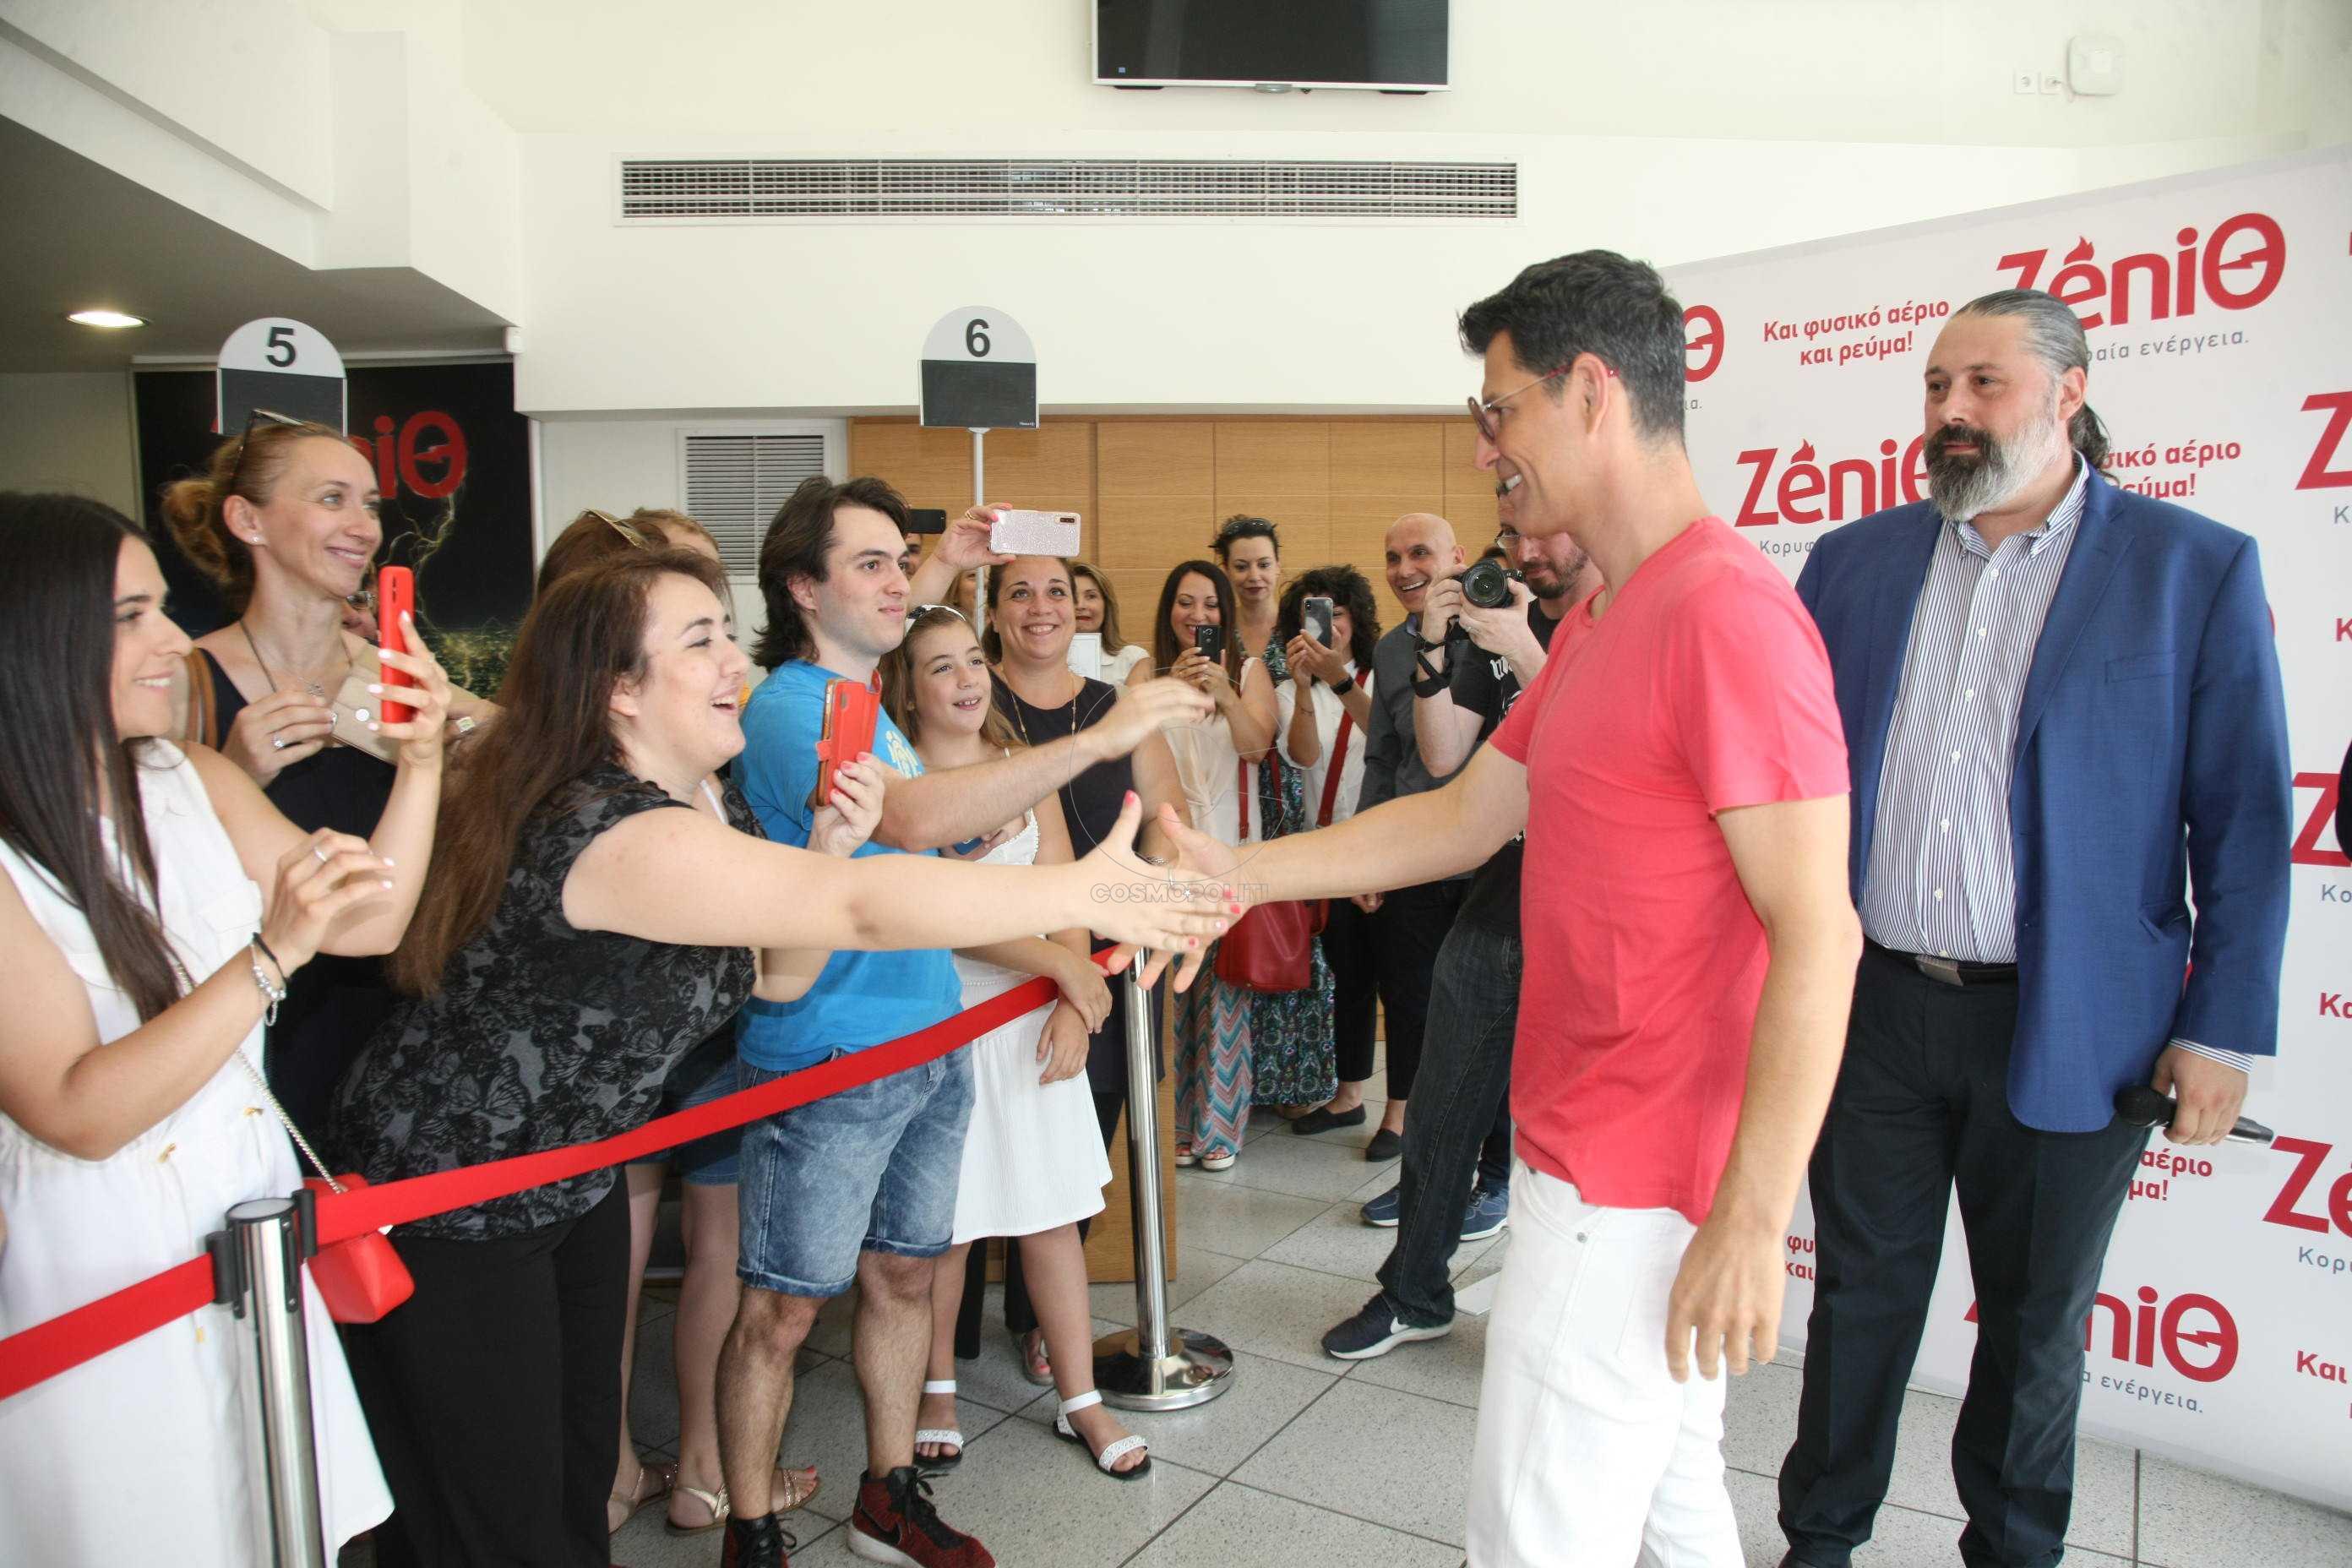 sakis_rouvas_zenith_store_thessaloniki_2_2